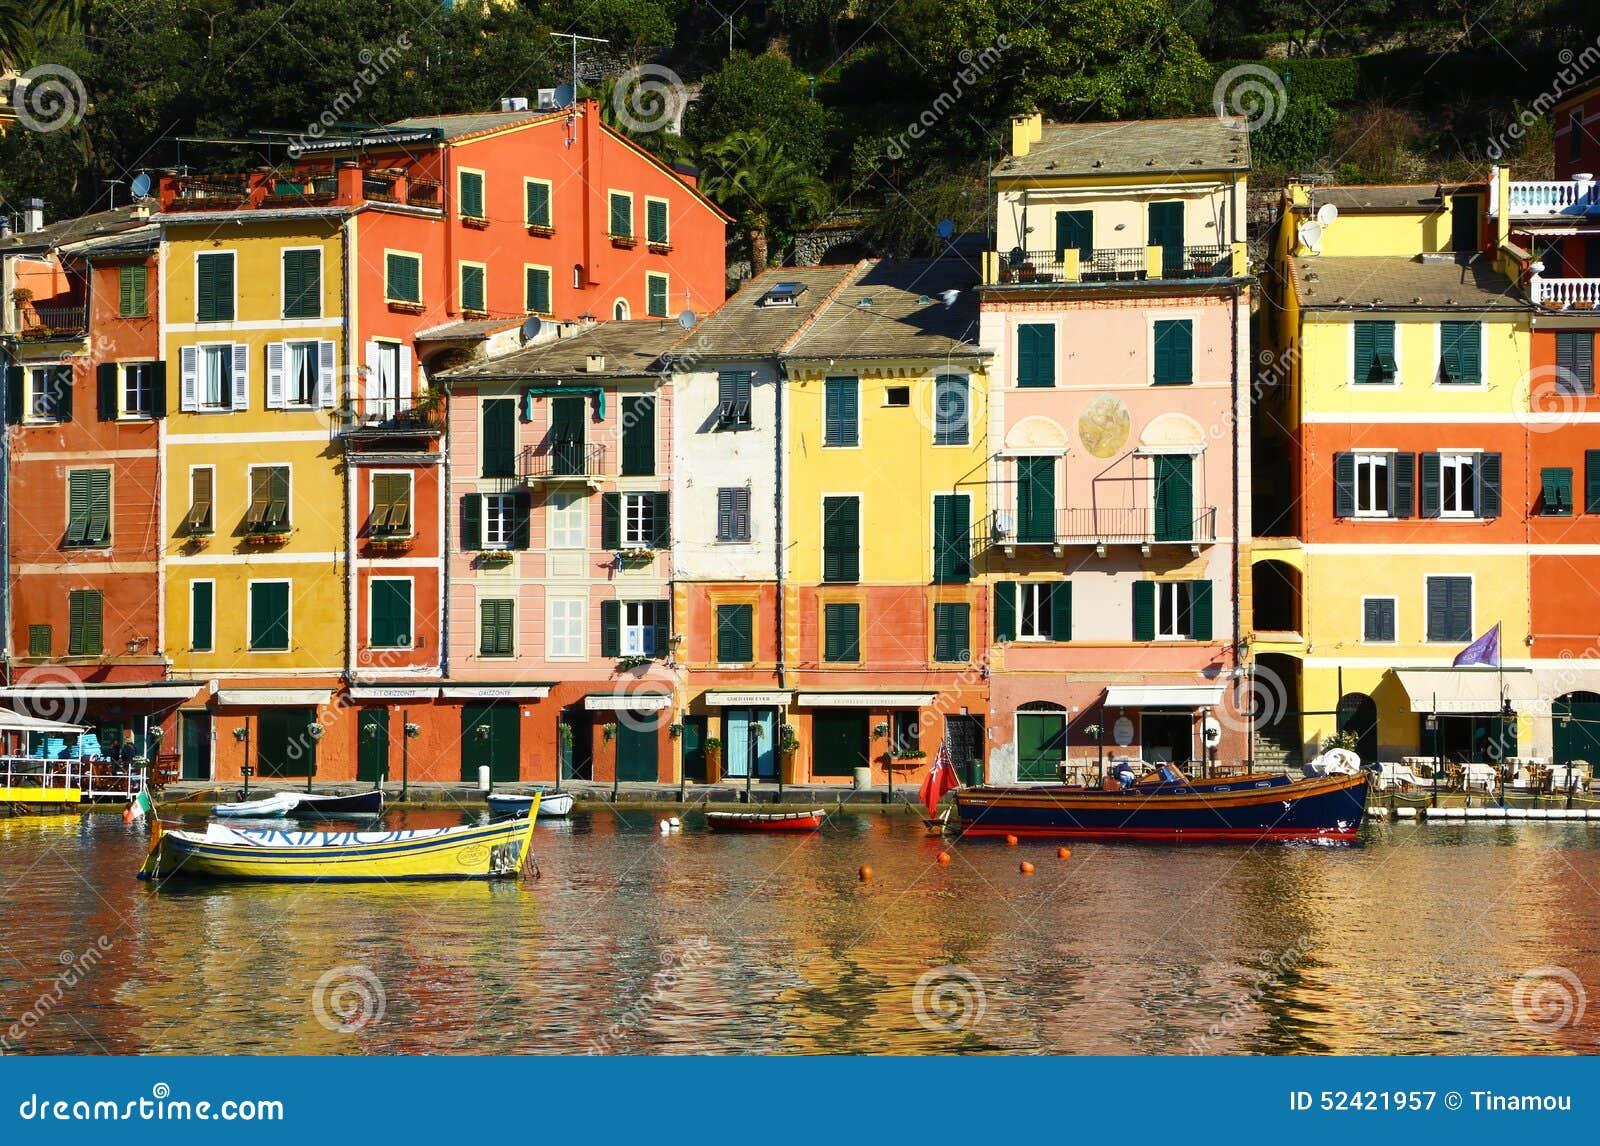 Huizen In Italie : Kleurrijke huizen in portofino italië redactionele fotografie